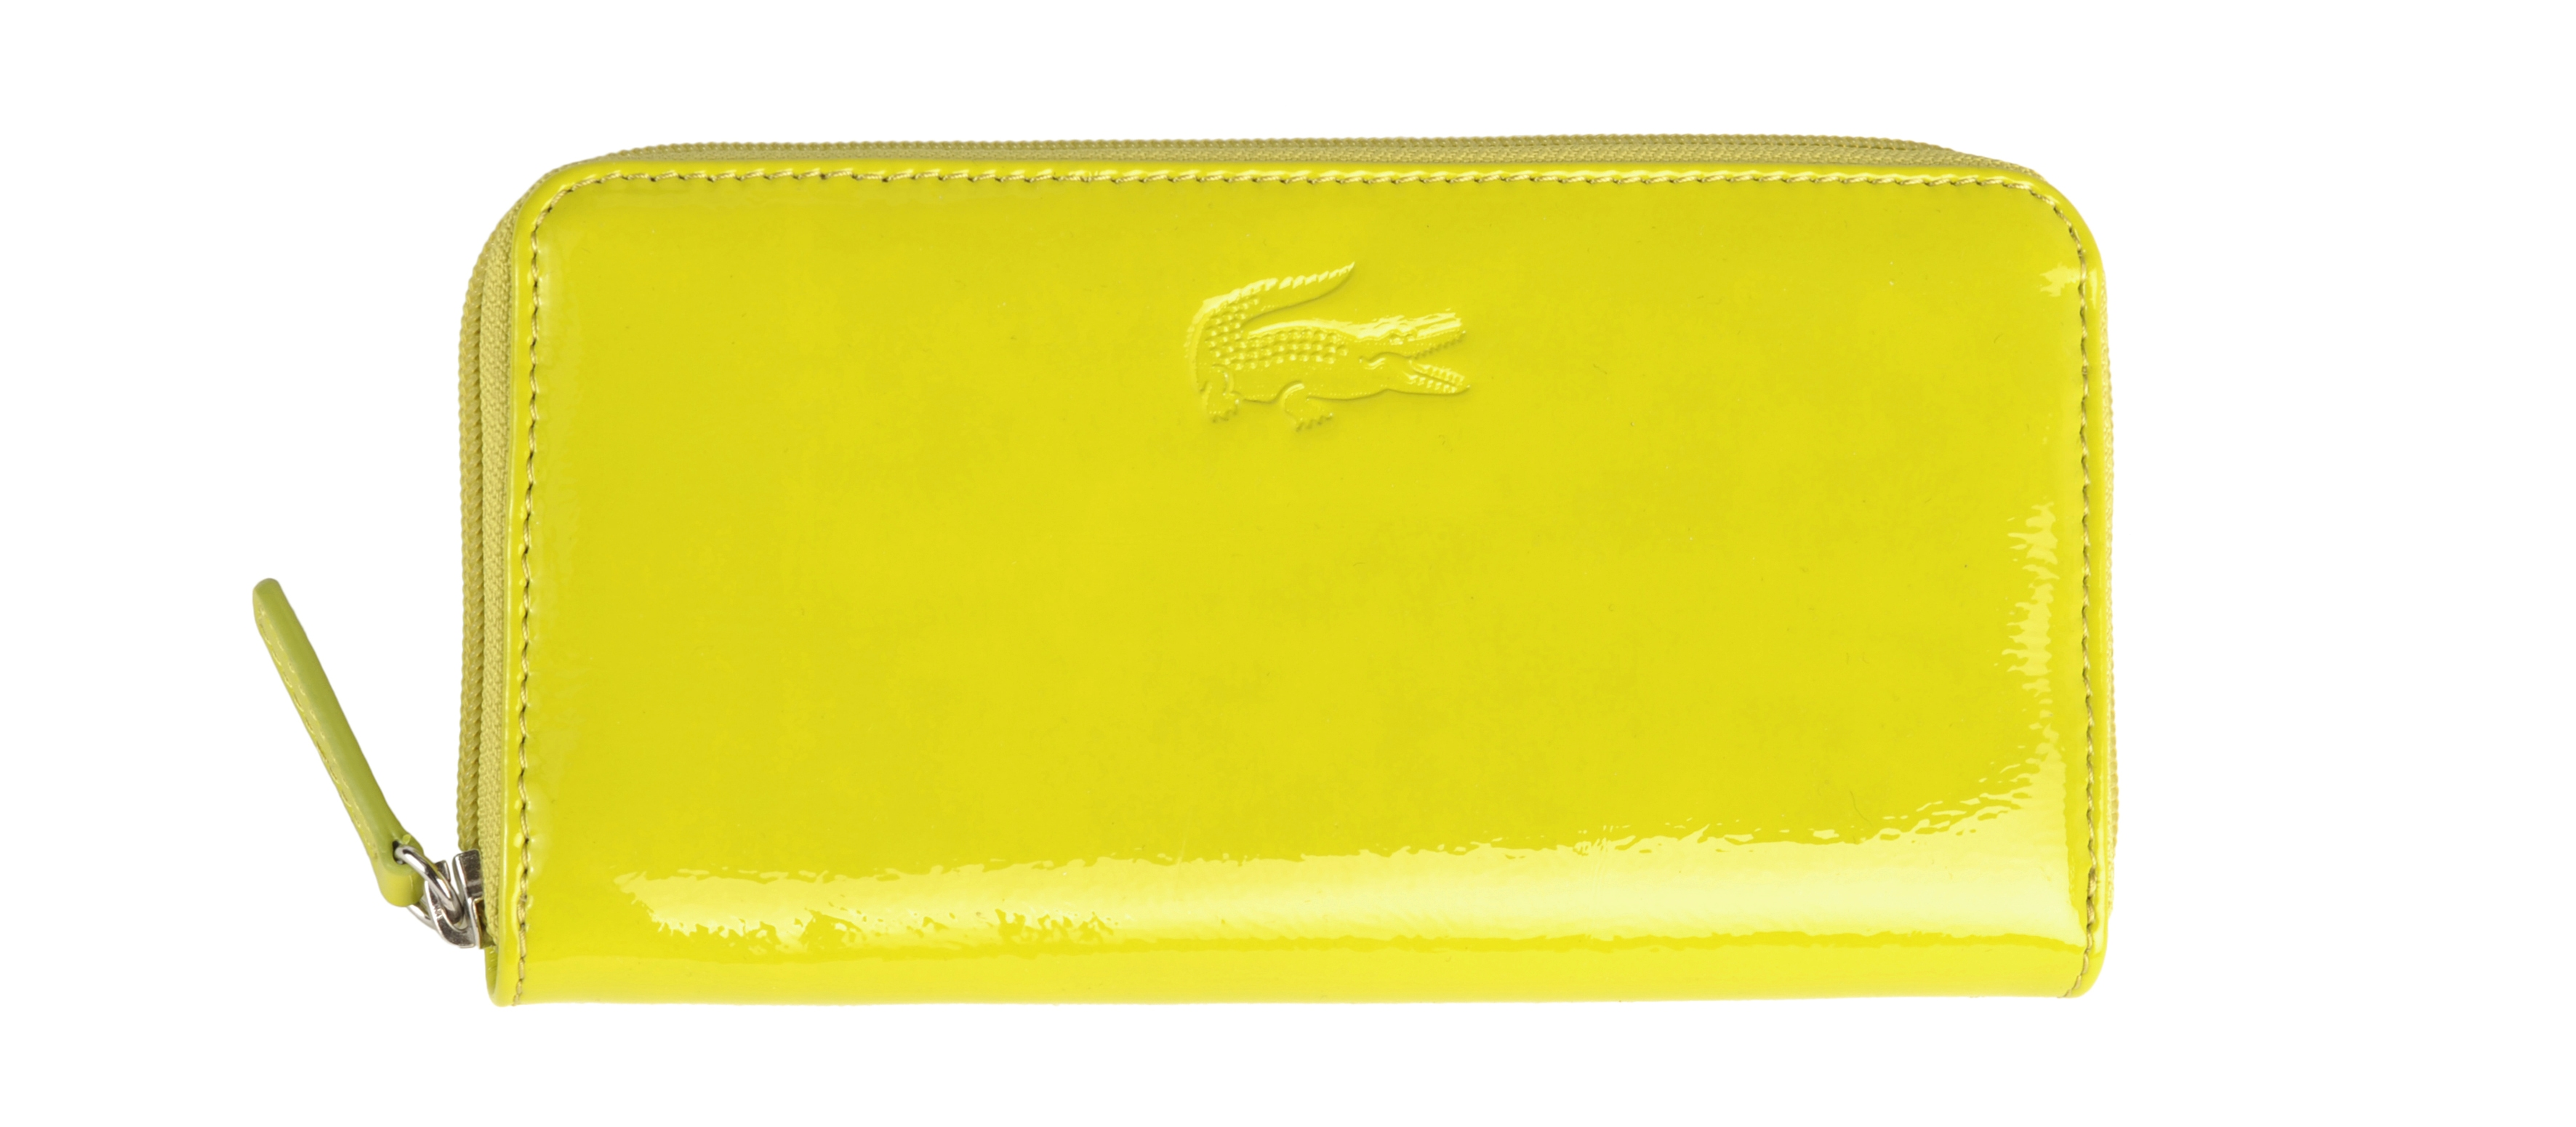 Zip Wallet from Lacoste